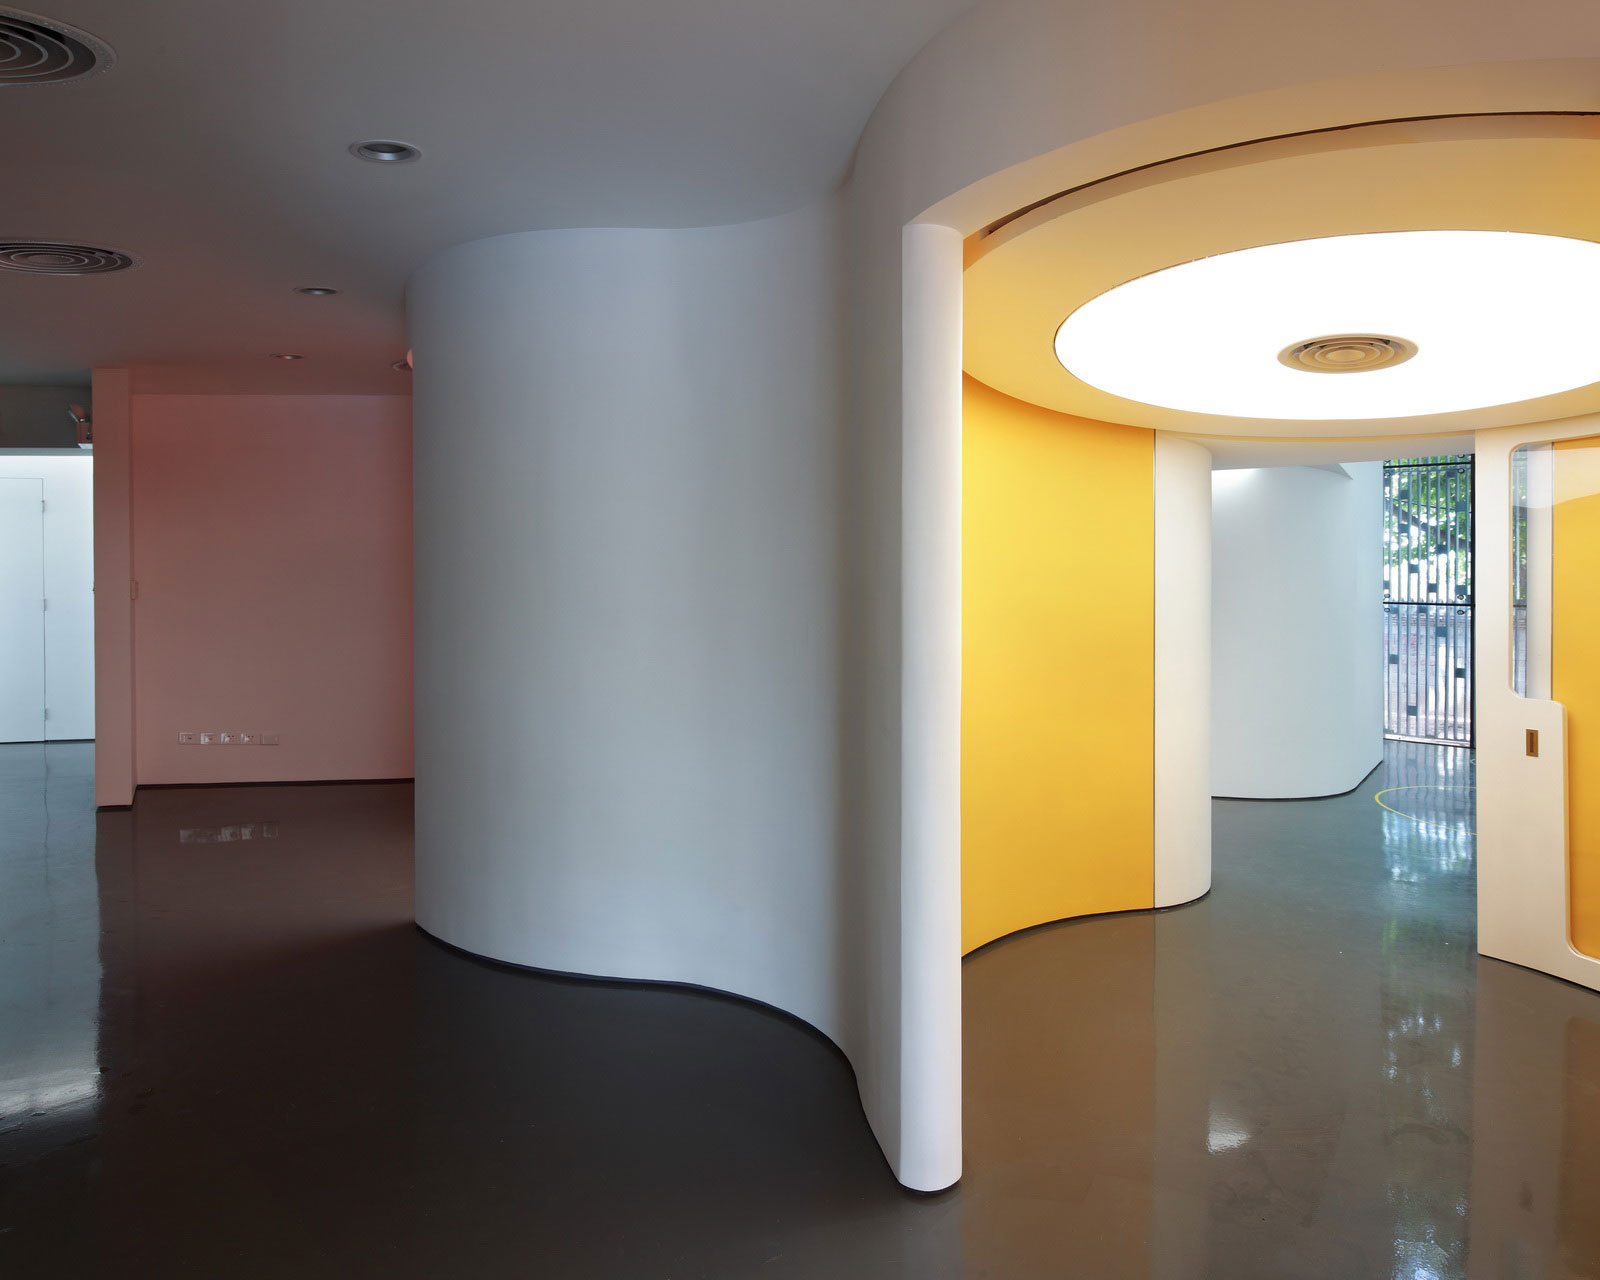 interior-1st floor (1)